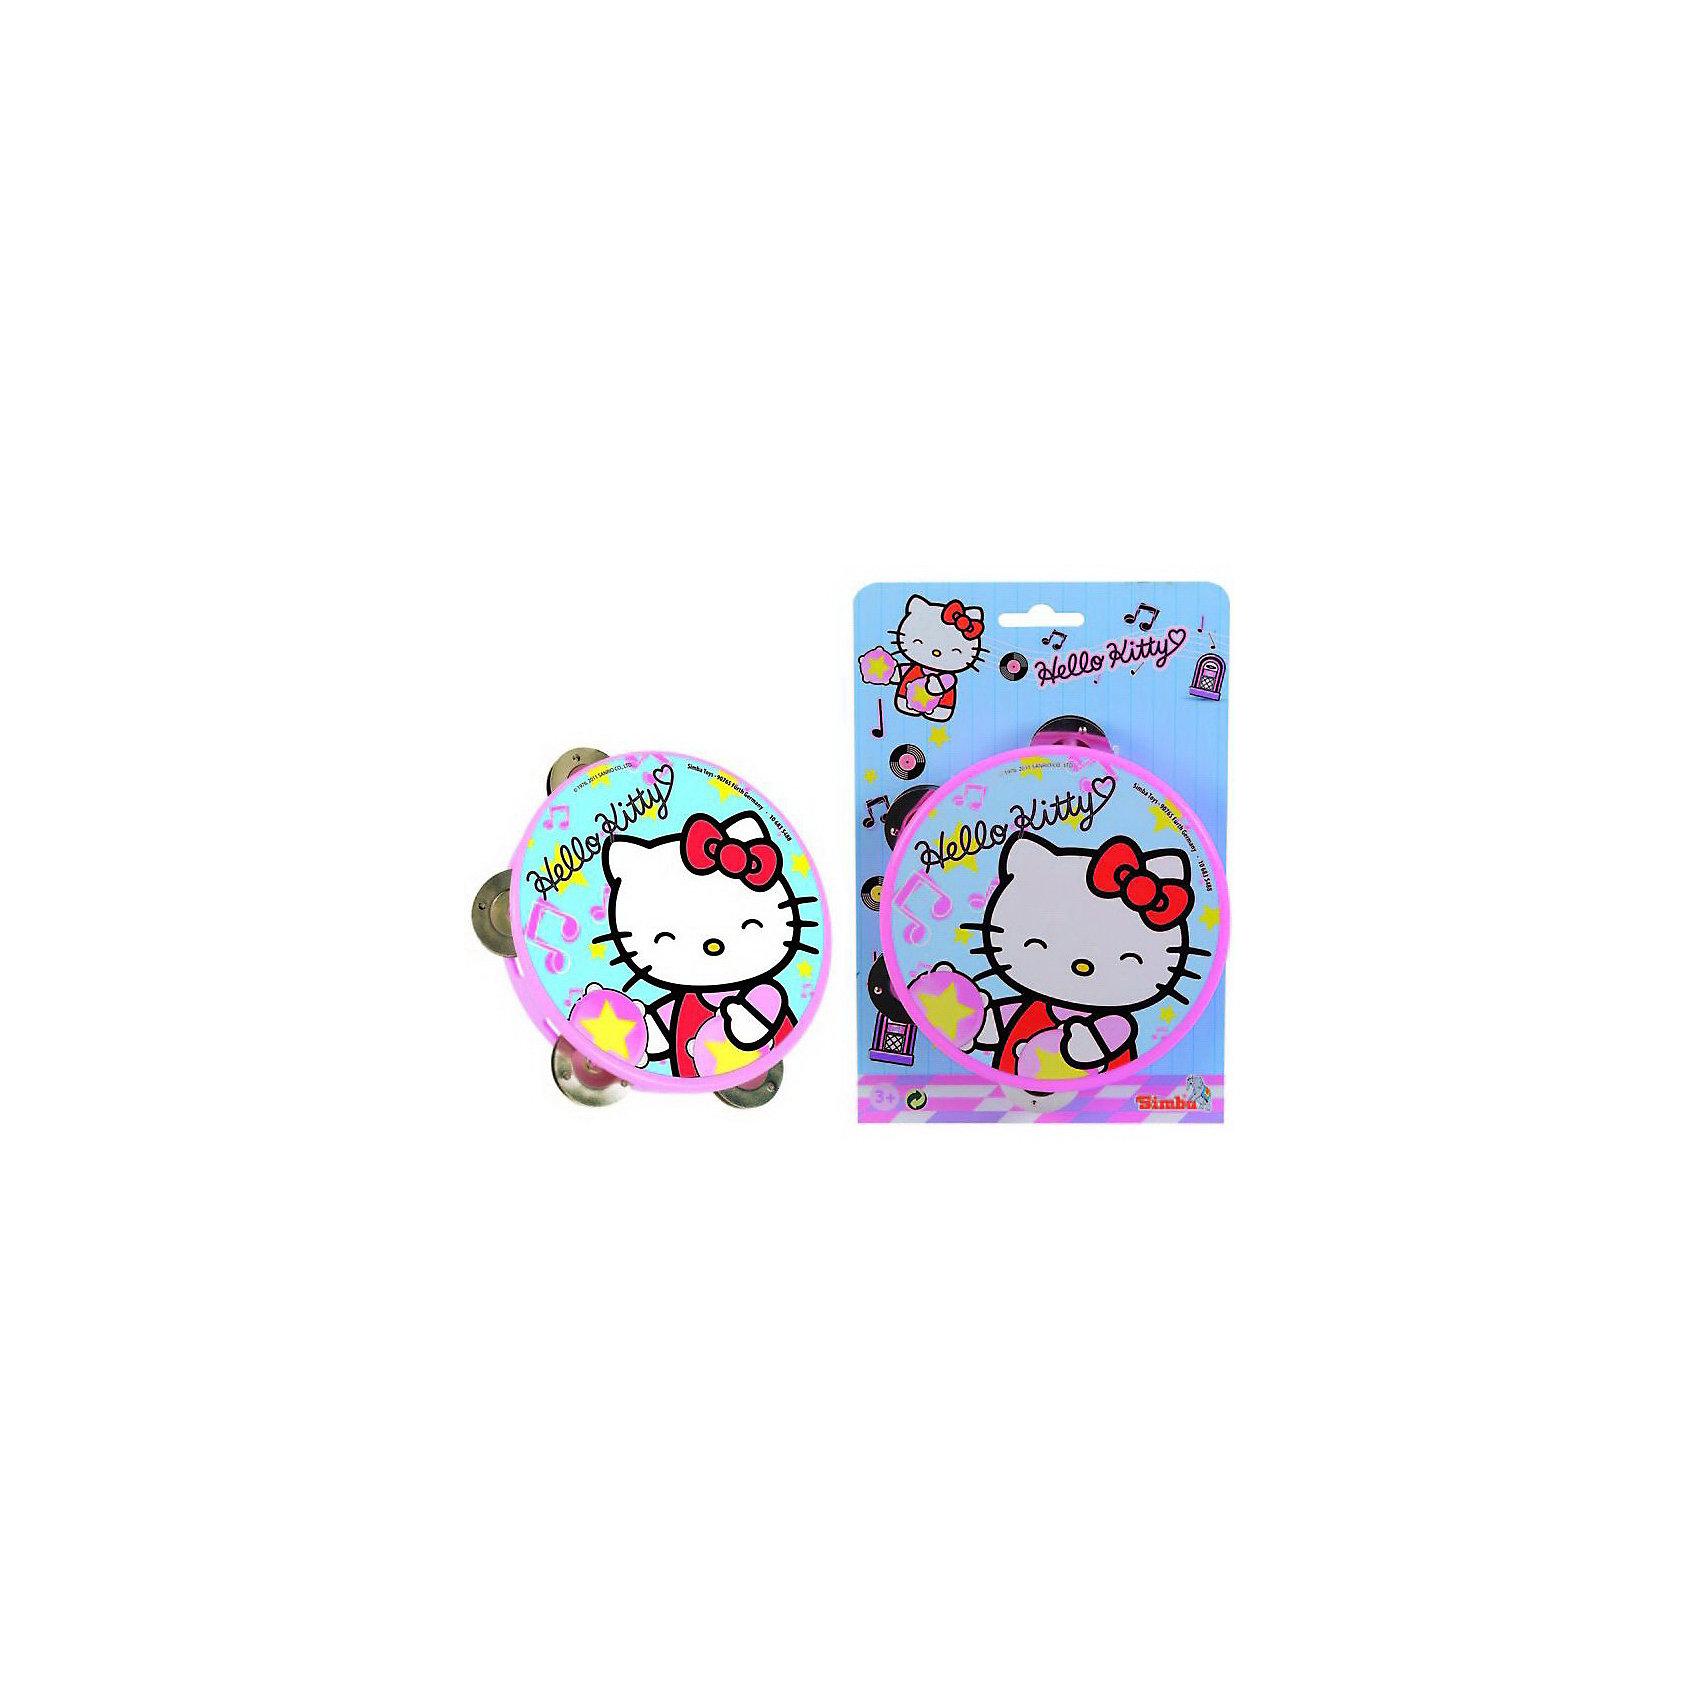 Simba Simba                 Тамбурин Hello Kitty simba еви с длинными волосами 2 расчески заколочки hello kitty